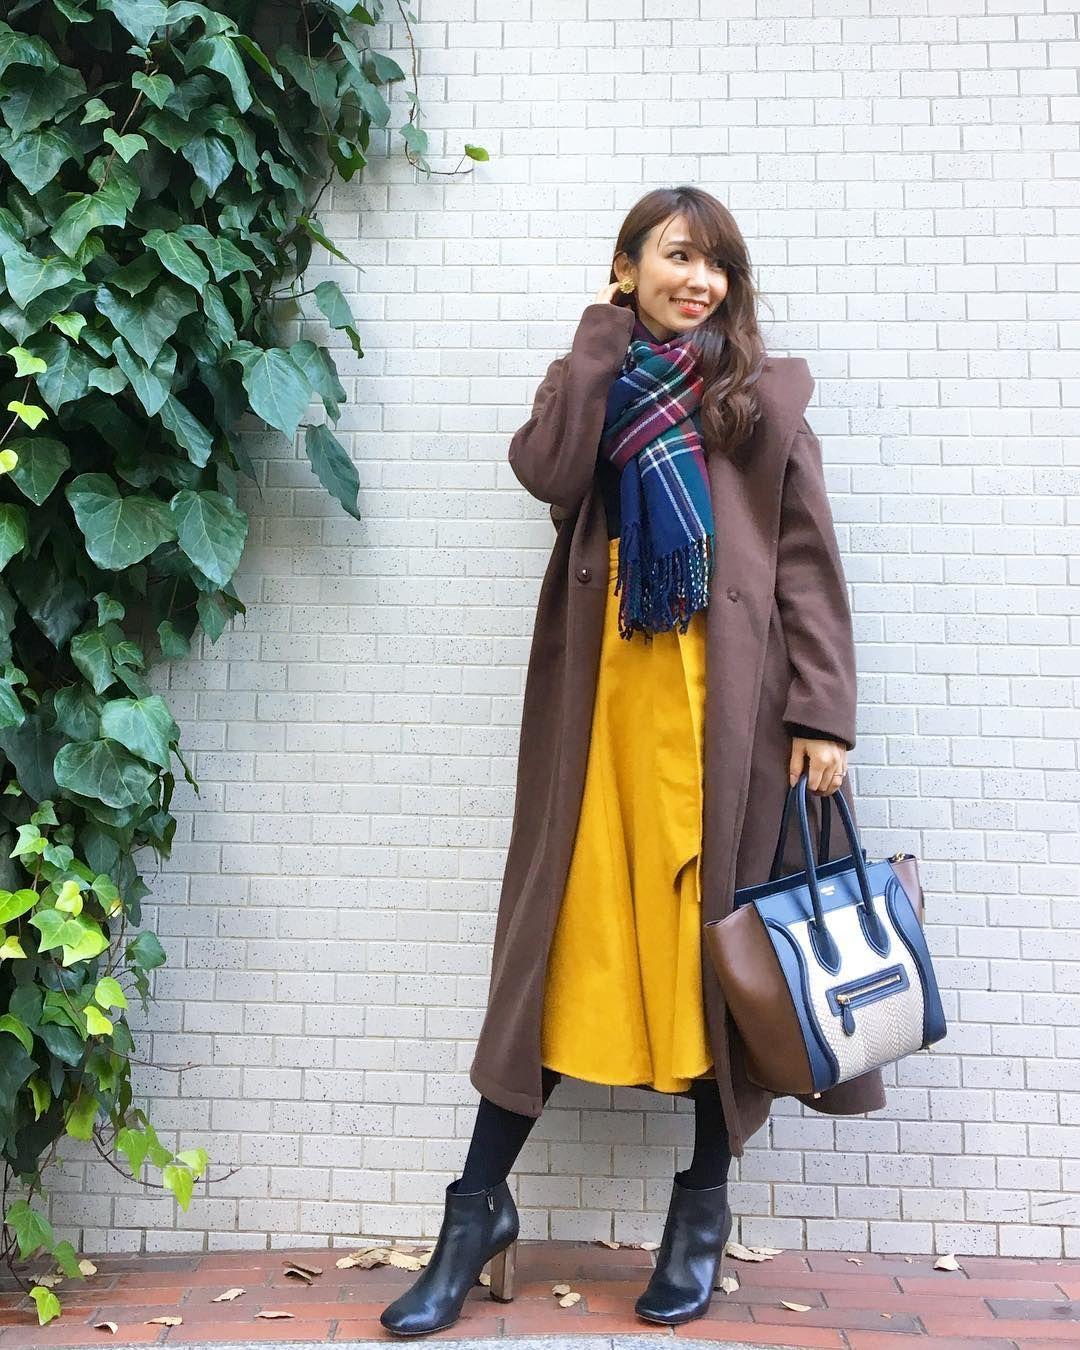 Shizuka Watanabe On Instagram 本日は午前保育の後に幼稚園のお友達